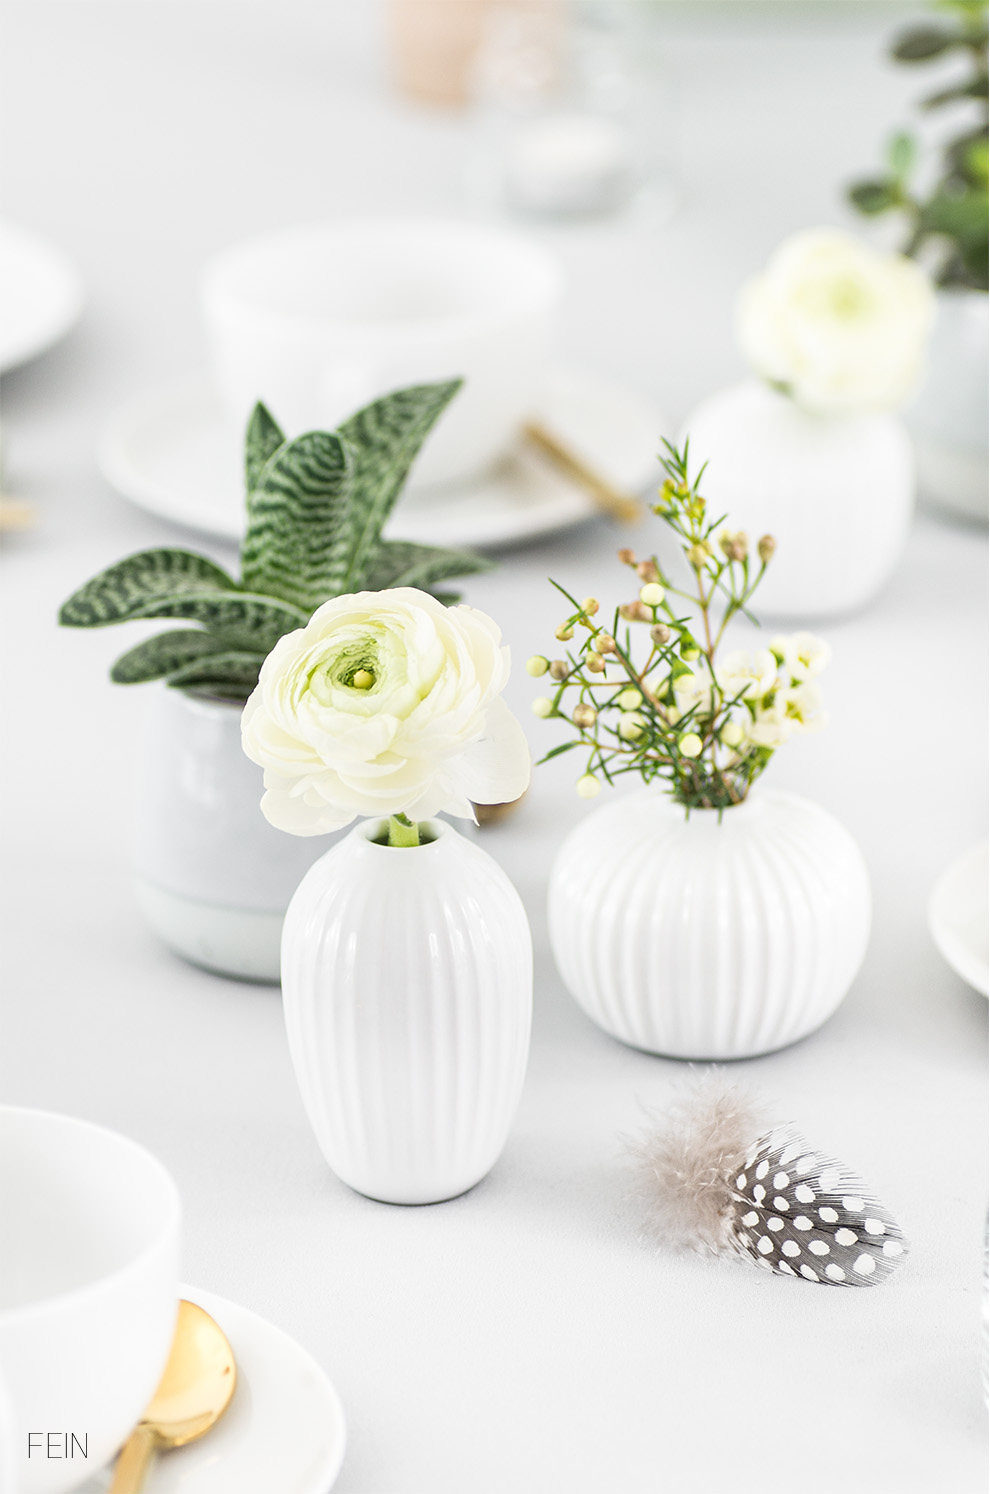 Osterbrunch Vasen Kähler Hammershoi